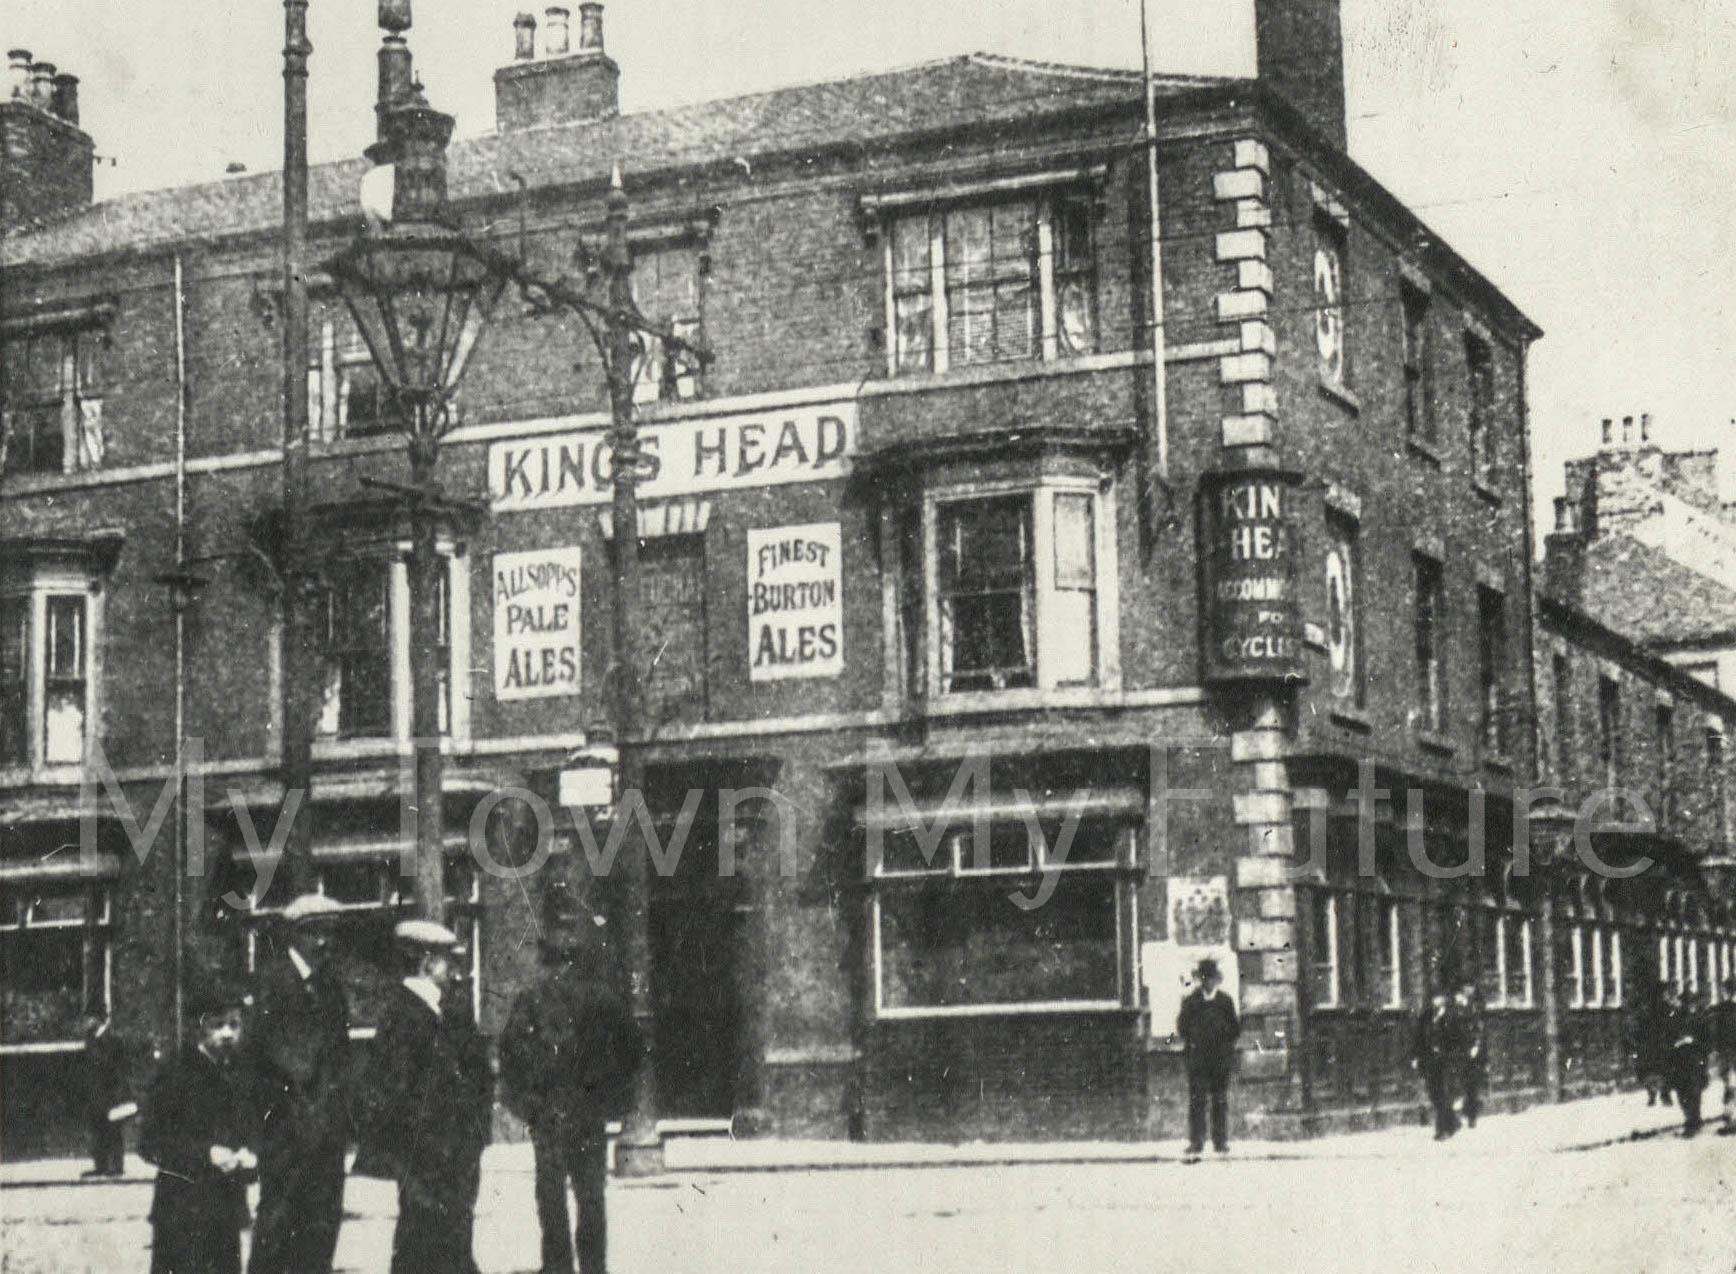 Kings Head Hotel 1 newport Road___